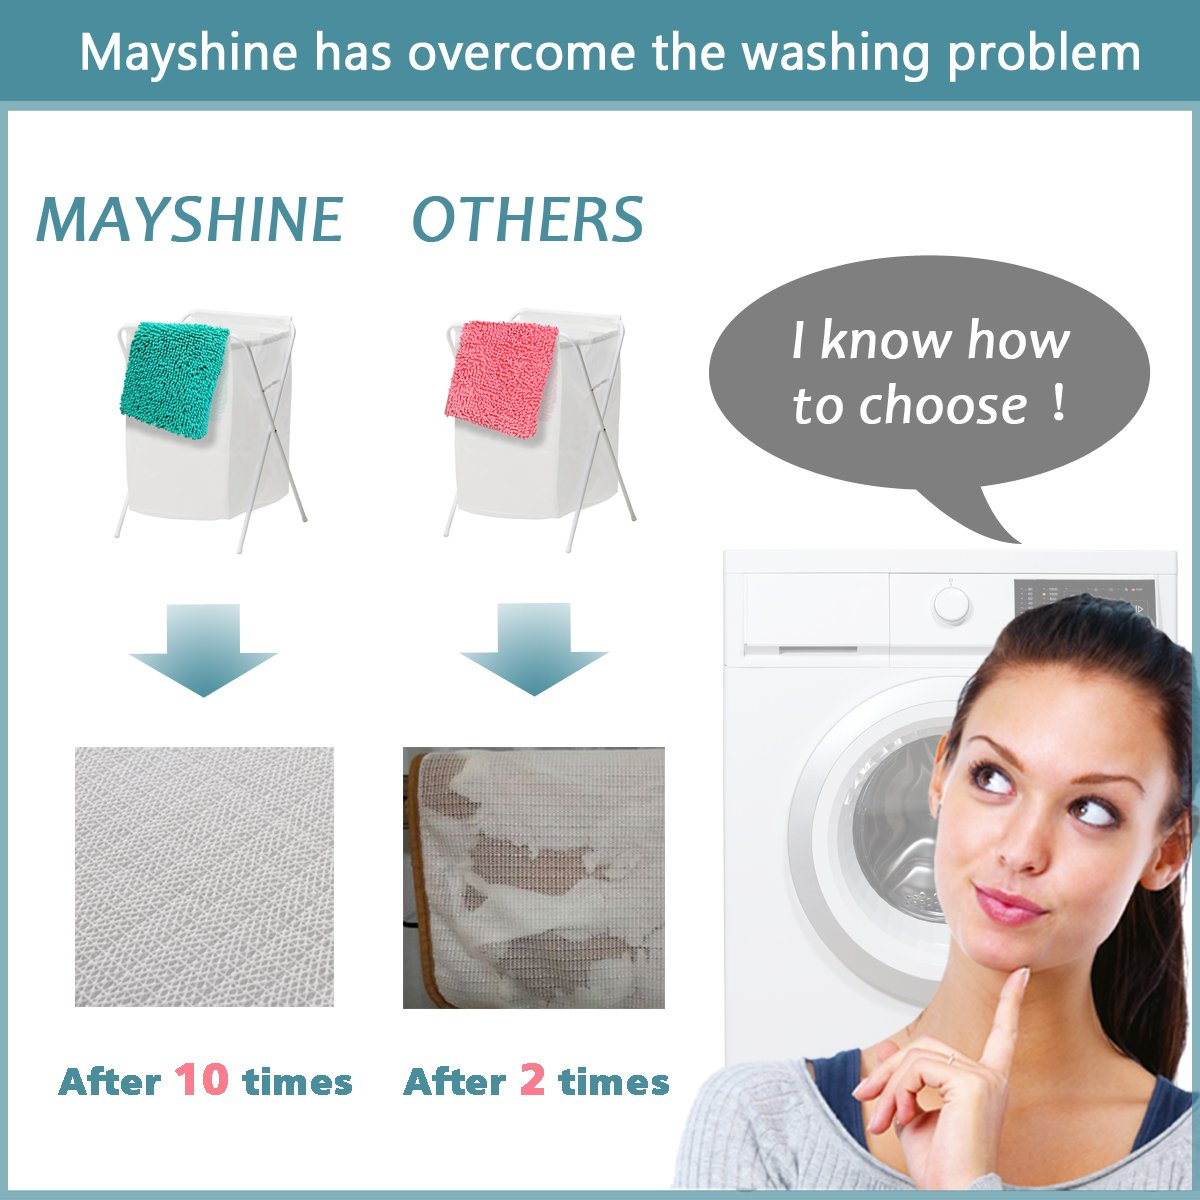 Mayshine Bath mats for Bathroom Rugs Non Slip Machine Washable Soft Microfiber 2 Pack (20×32 inches, Turquoise) by MAYSHINE (Image #6)